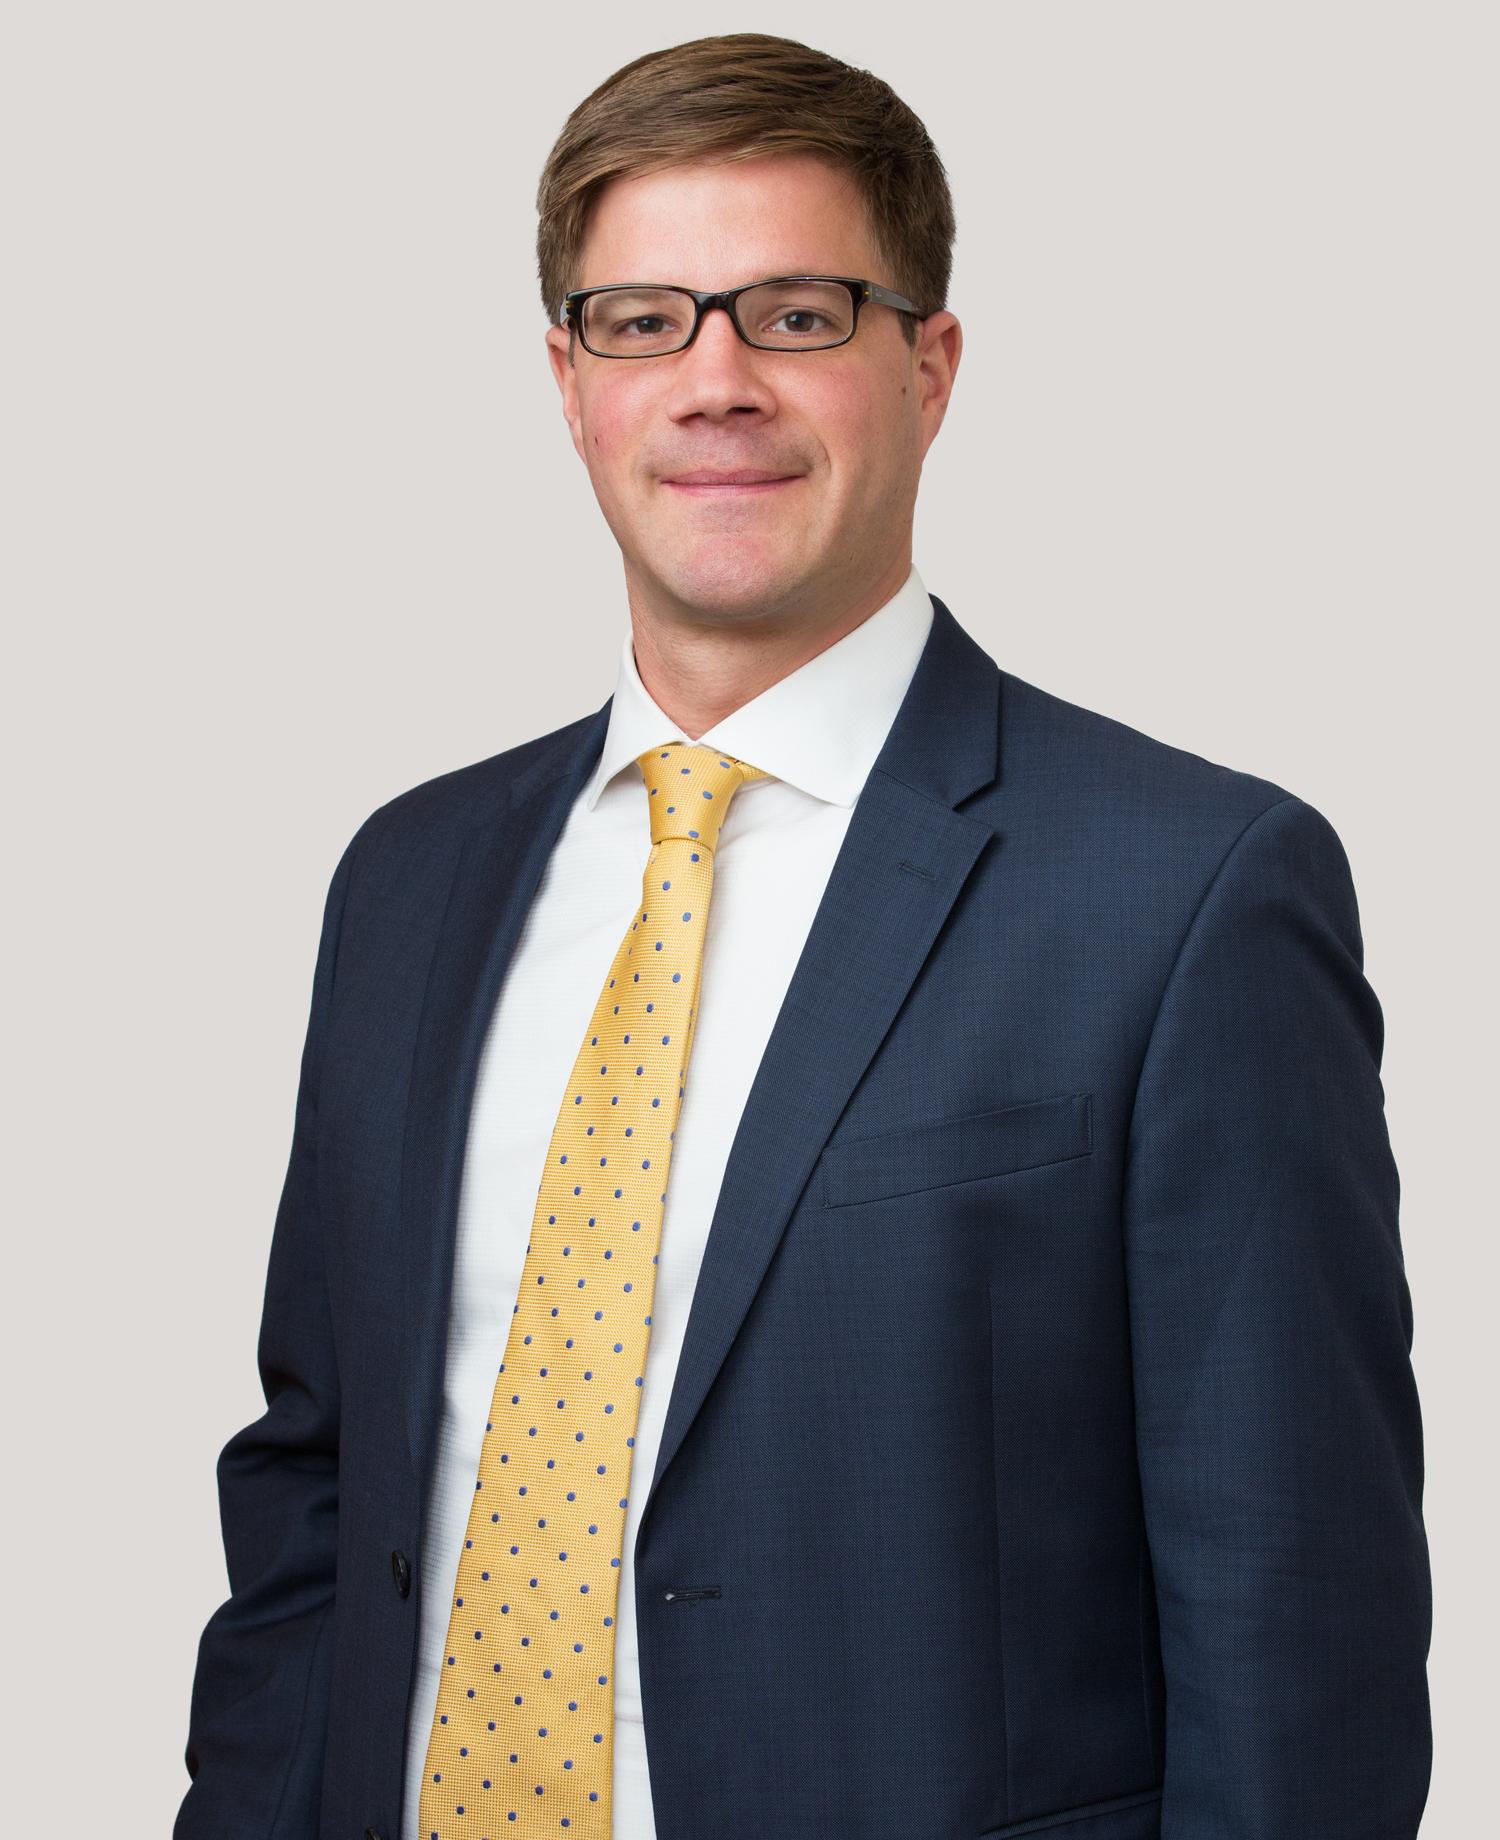 Benjamin W. Hutten